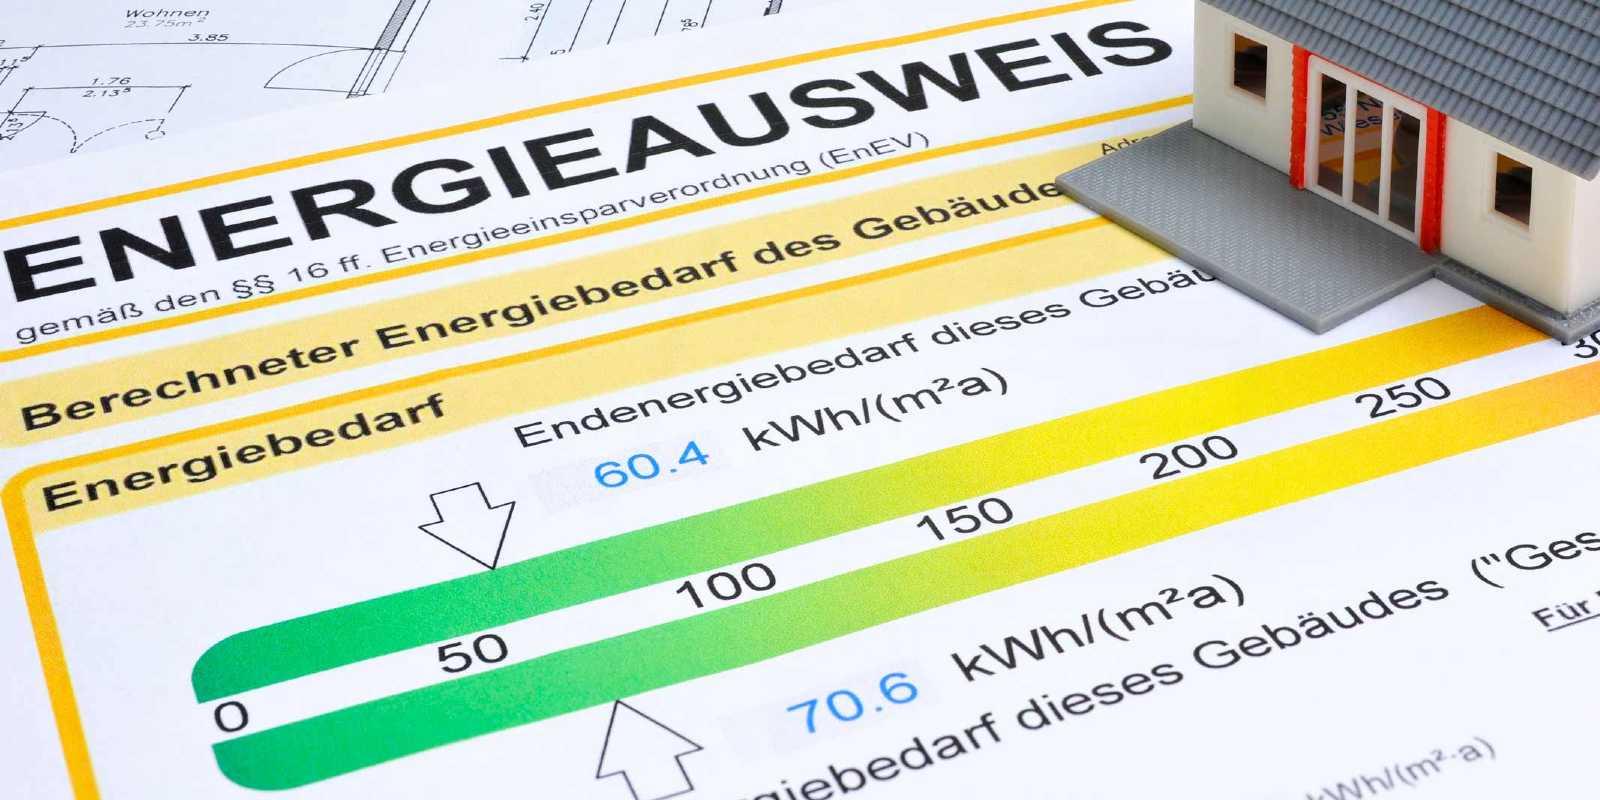 Stadtwerke Neustadt Service Kachel Energieberatung Energieausweis